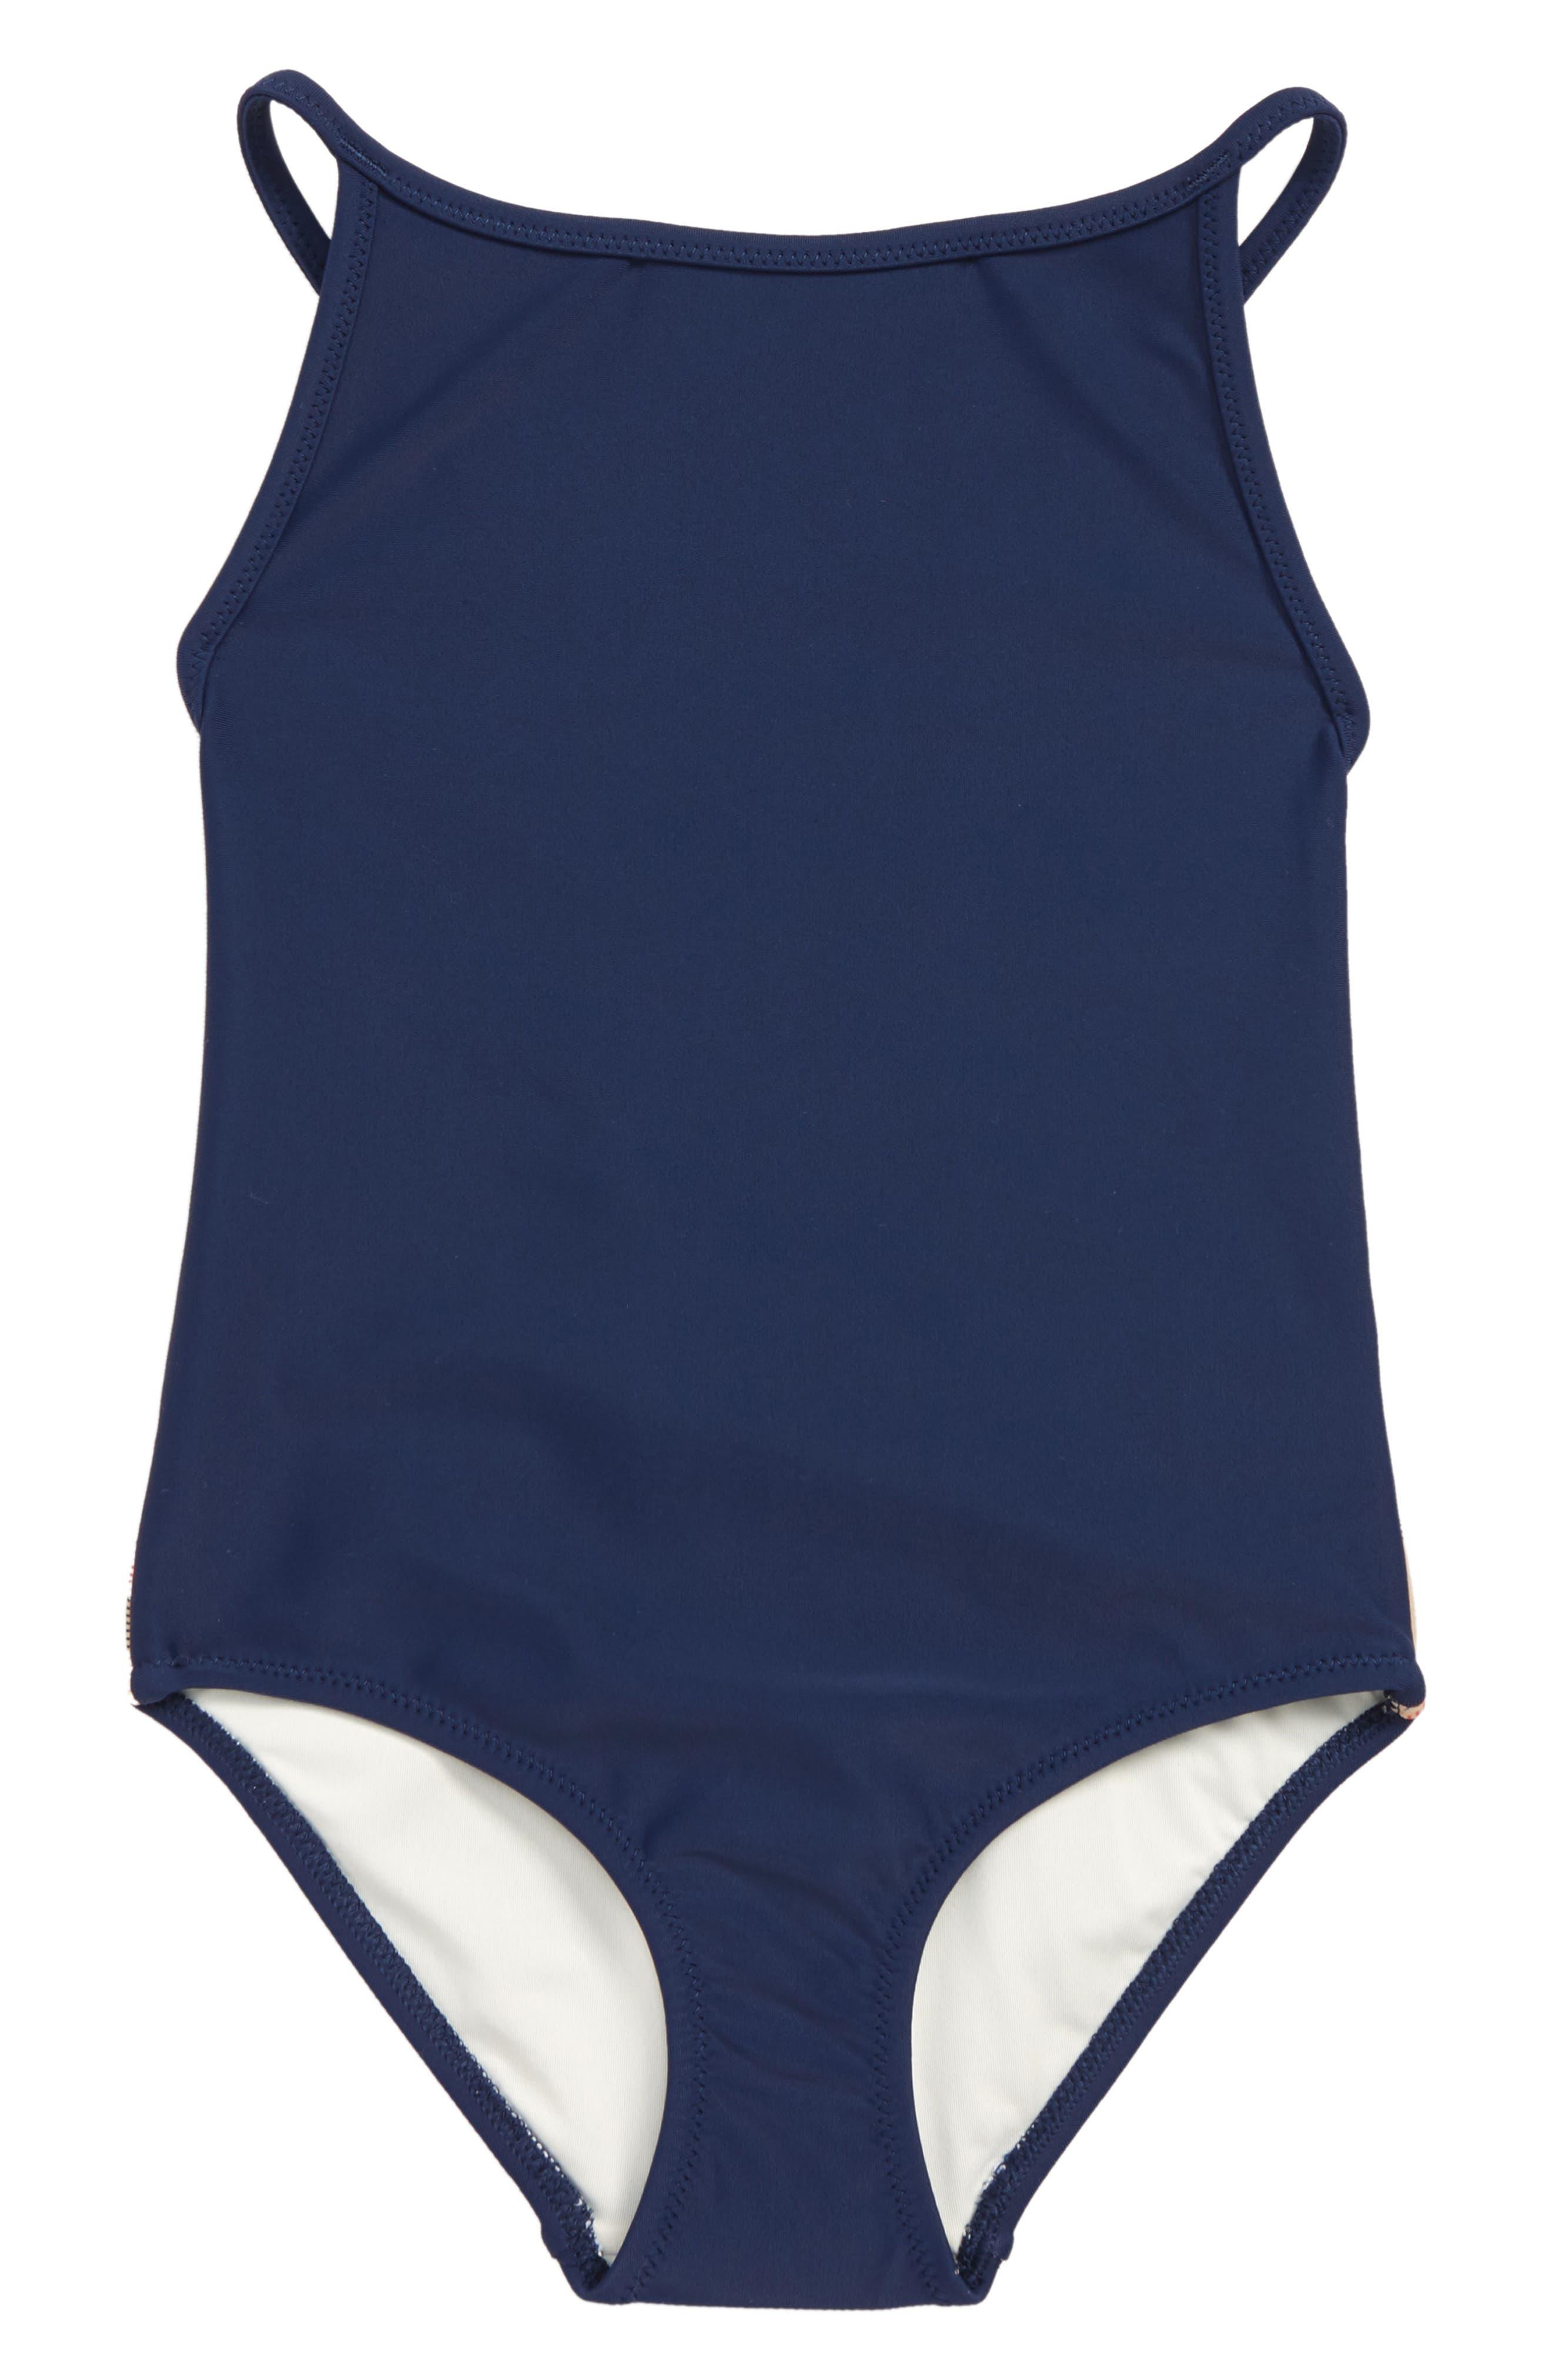 Sandine One-Piece Swimsuit,                             Main thumbnail 1, color,                             NAVY